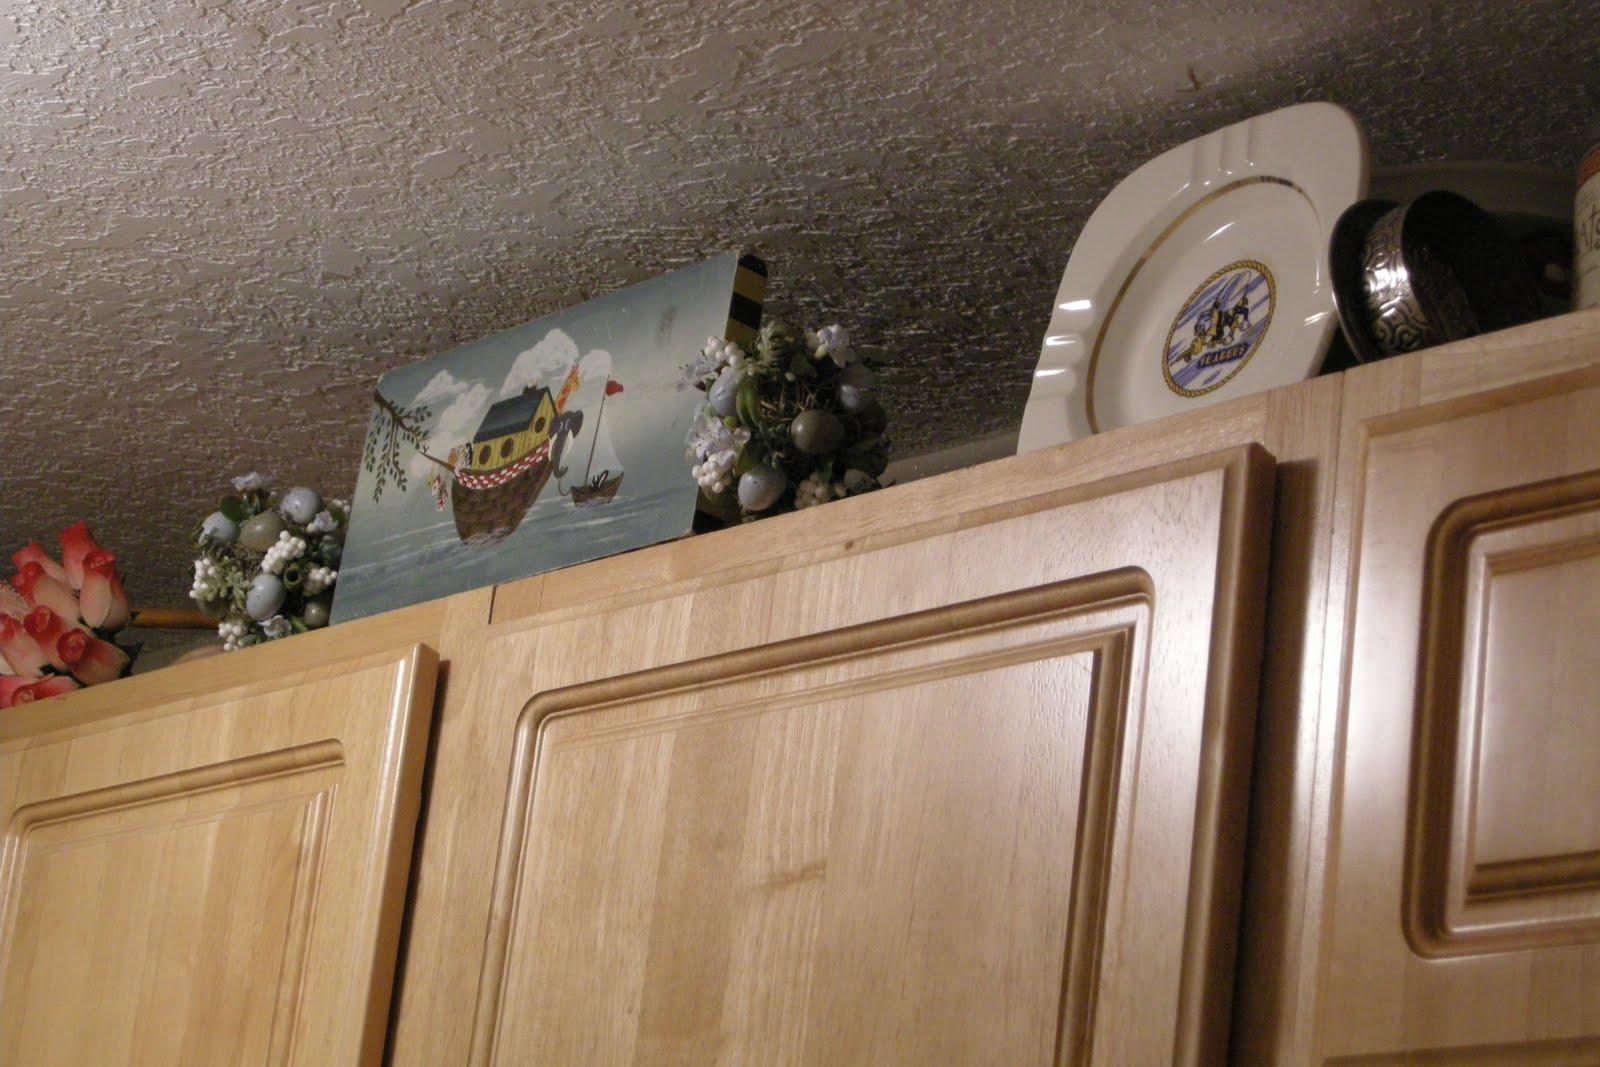 http://2.bp.blogspot.com/_ZWHi2fYLaV4/TH74RcOQ6WI/AAAAAAAABUY/YxIkfnCrzvE/s1600/Wallpaper+up+in+laundry+room+(6).JPG